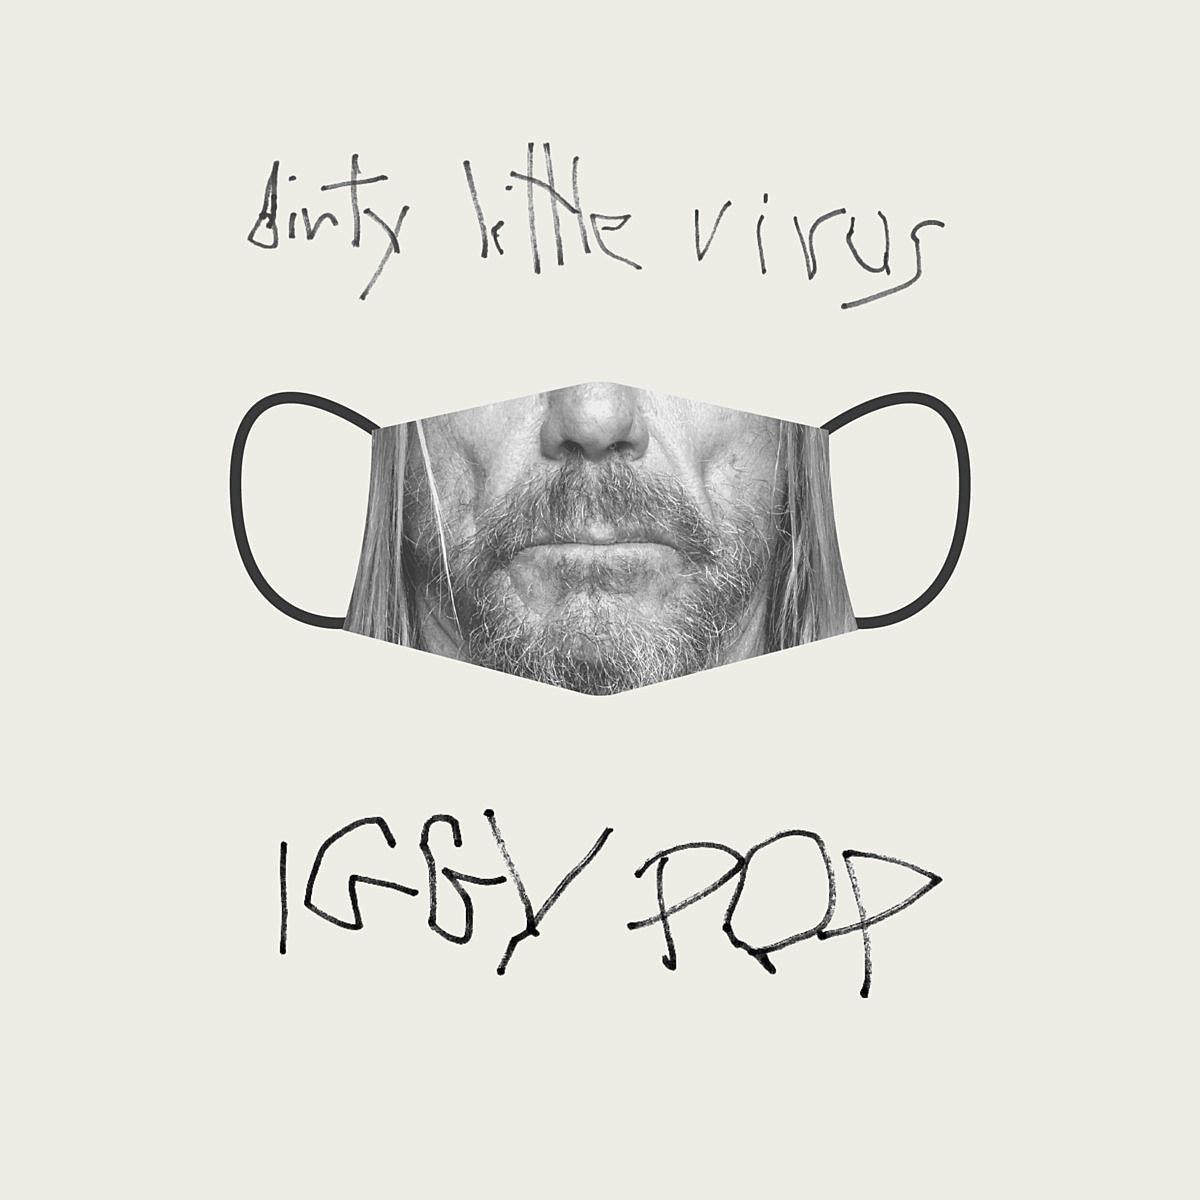 "Iggy Pop releases new song ""Dirty Little Virus"""